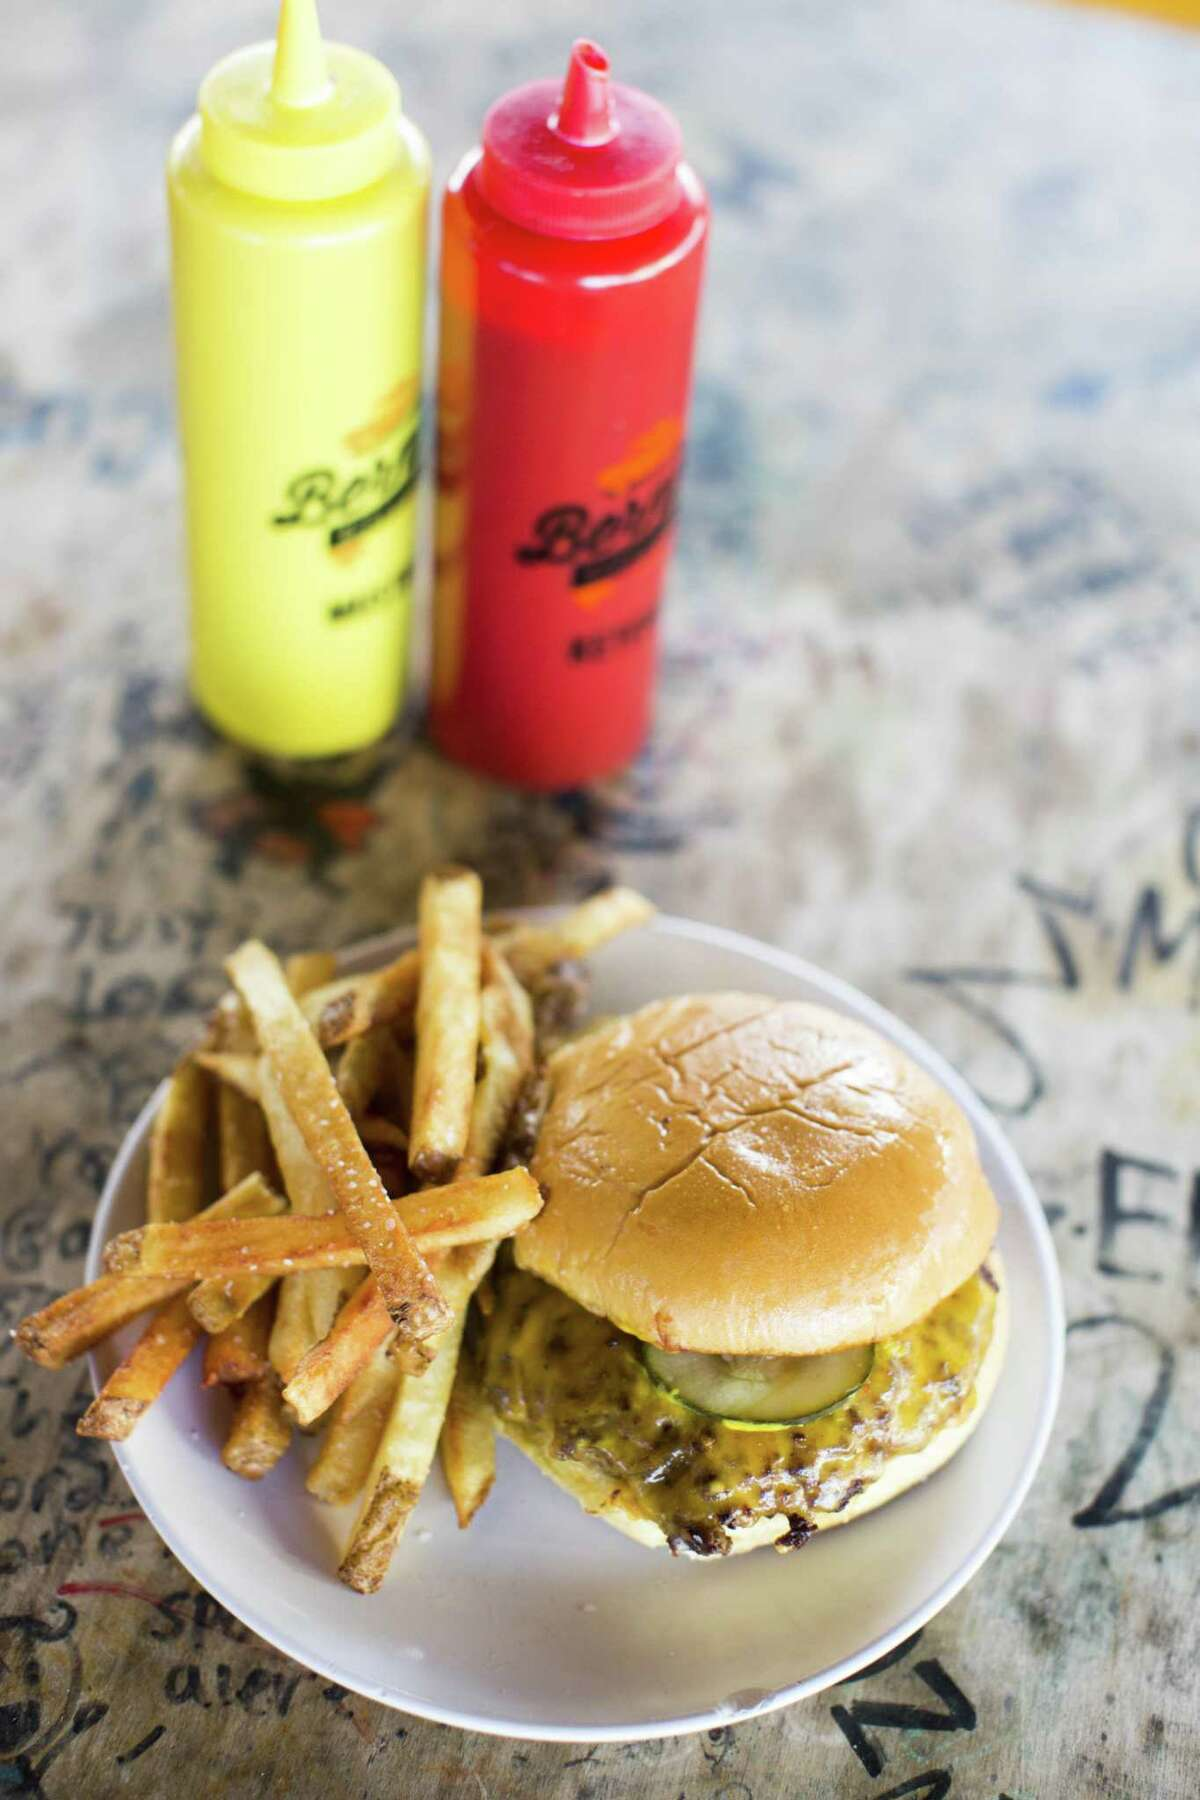 The First Grader burger and hand-cut fries at Bernie's Burger Bus